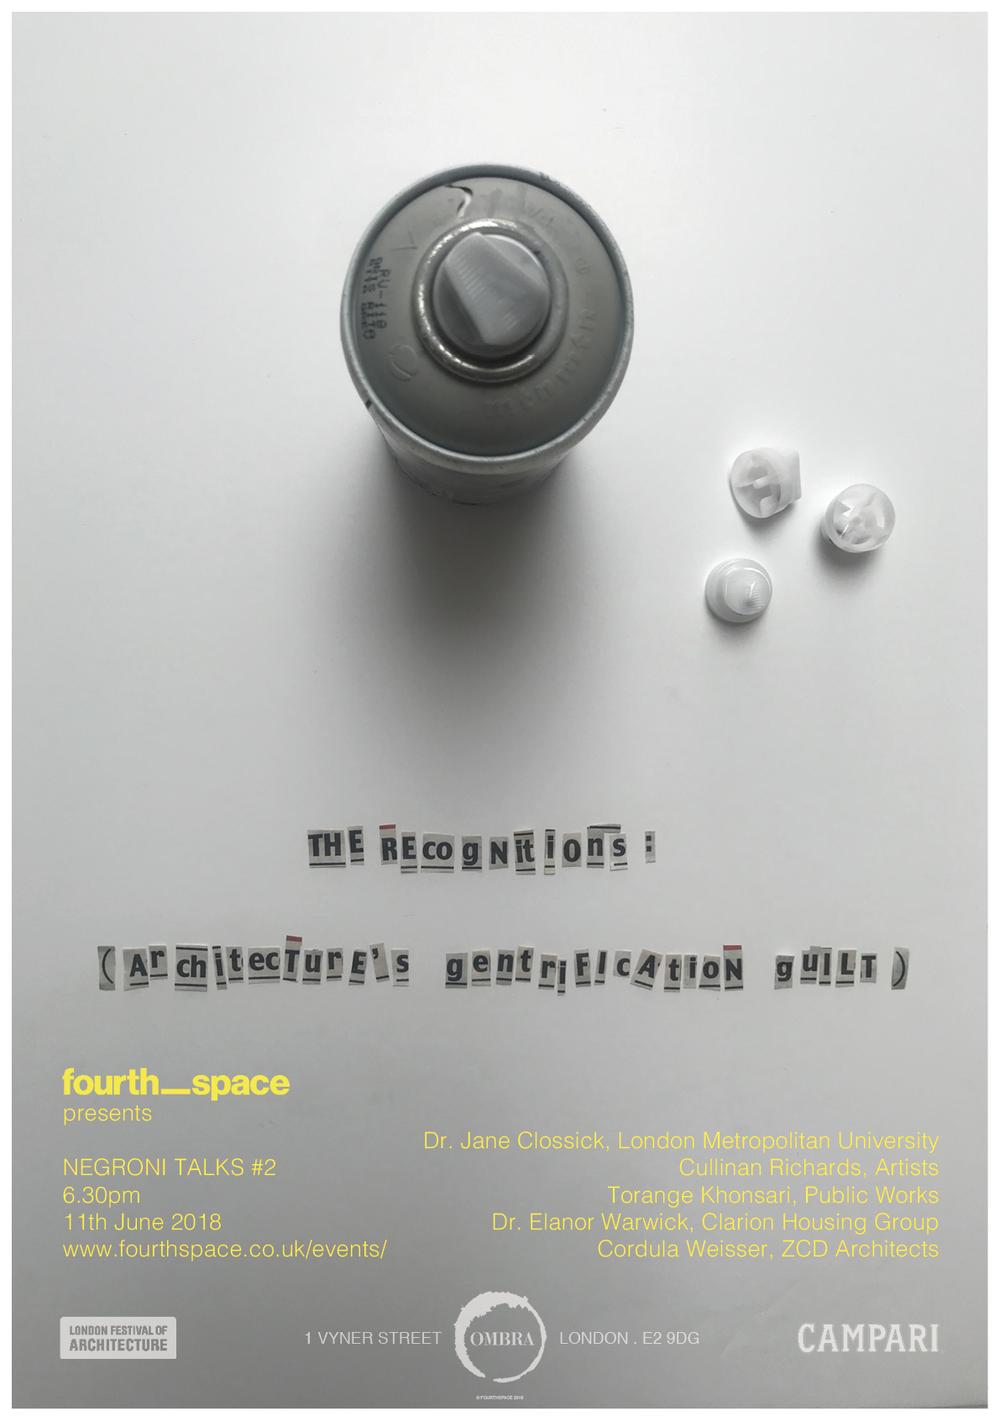 Negroni Talk #2 - 11.06.18